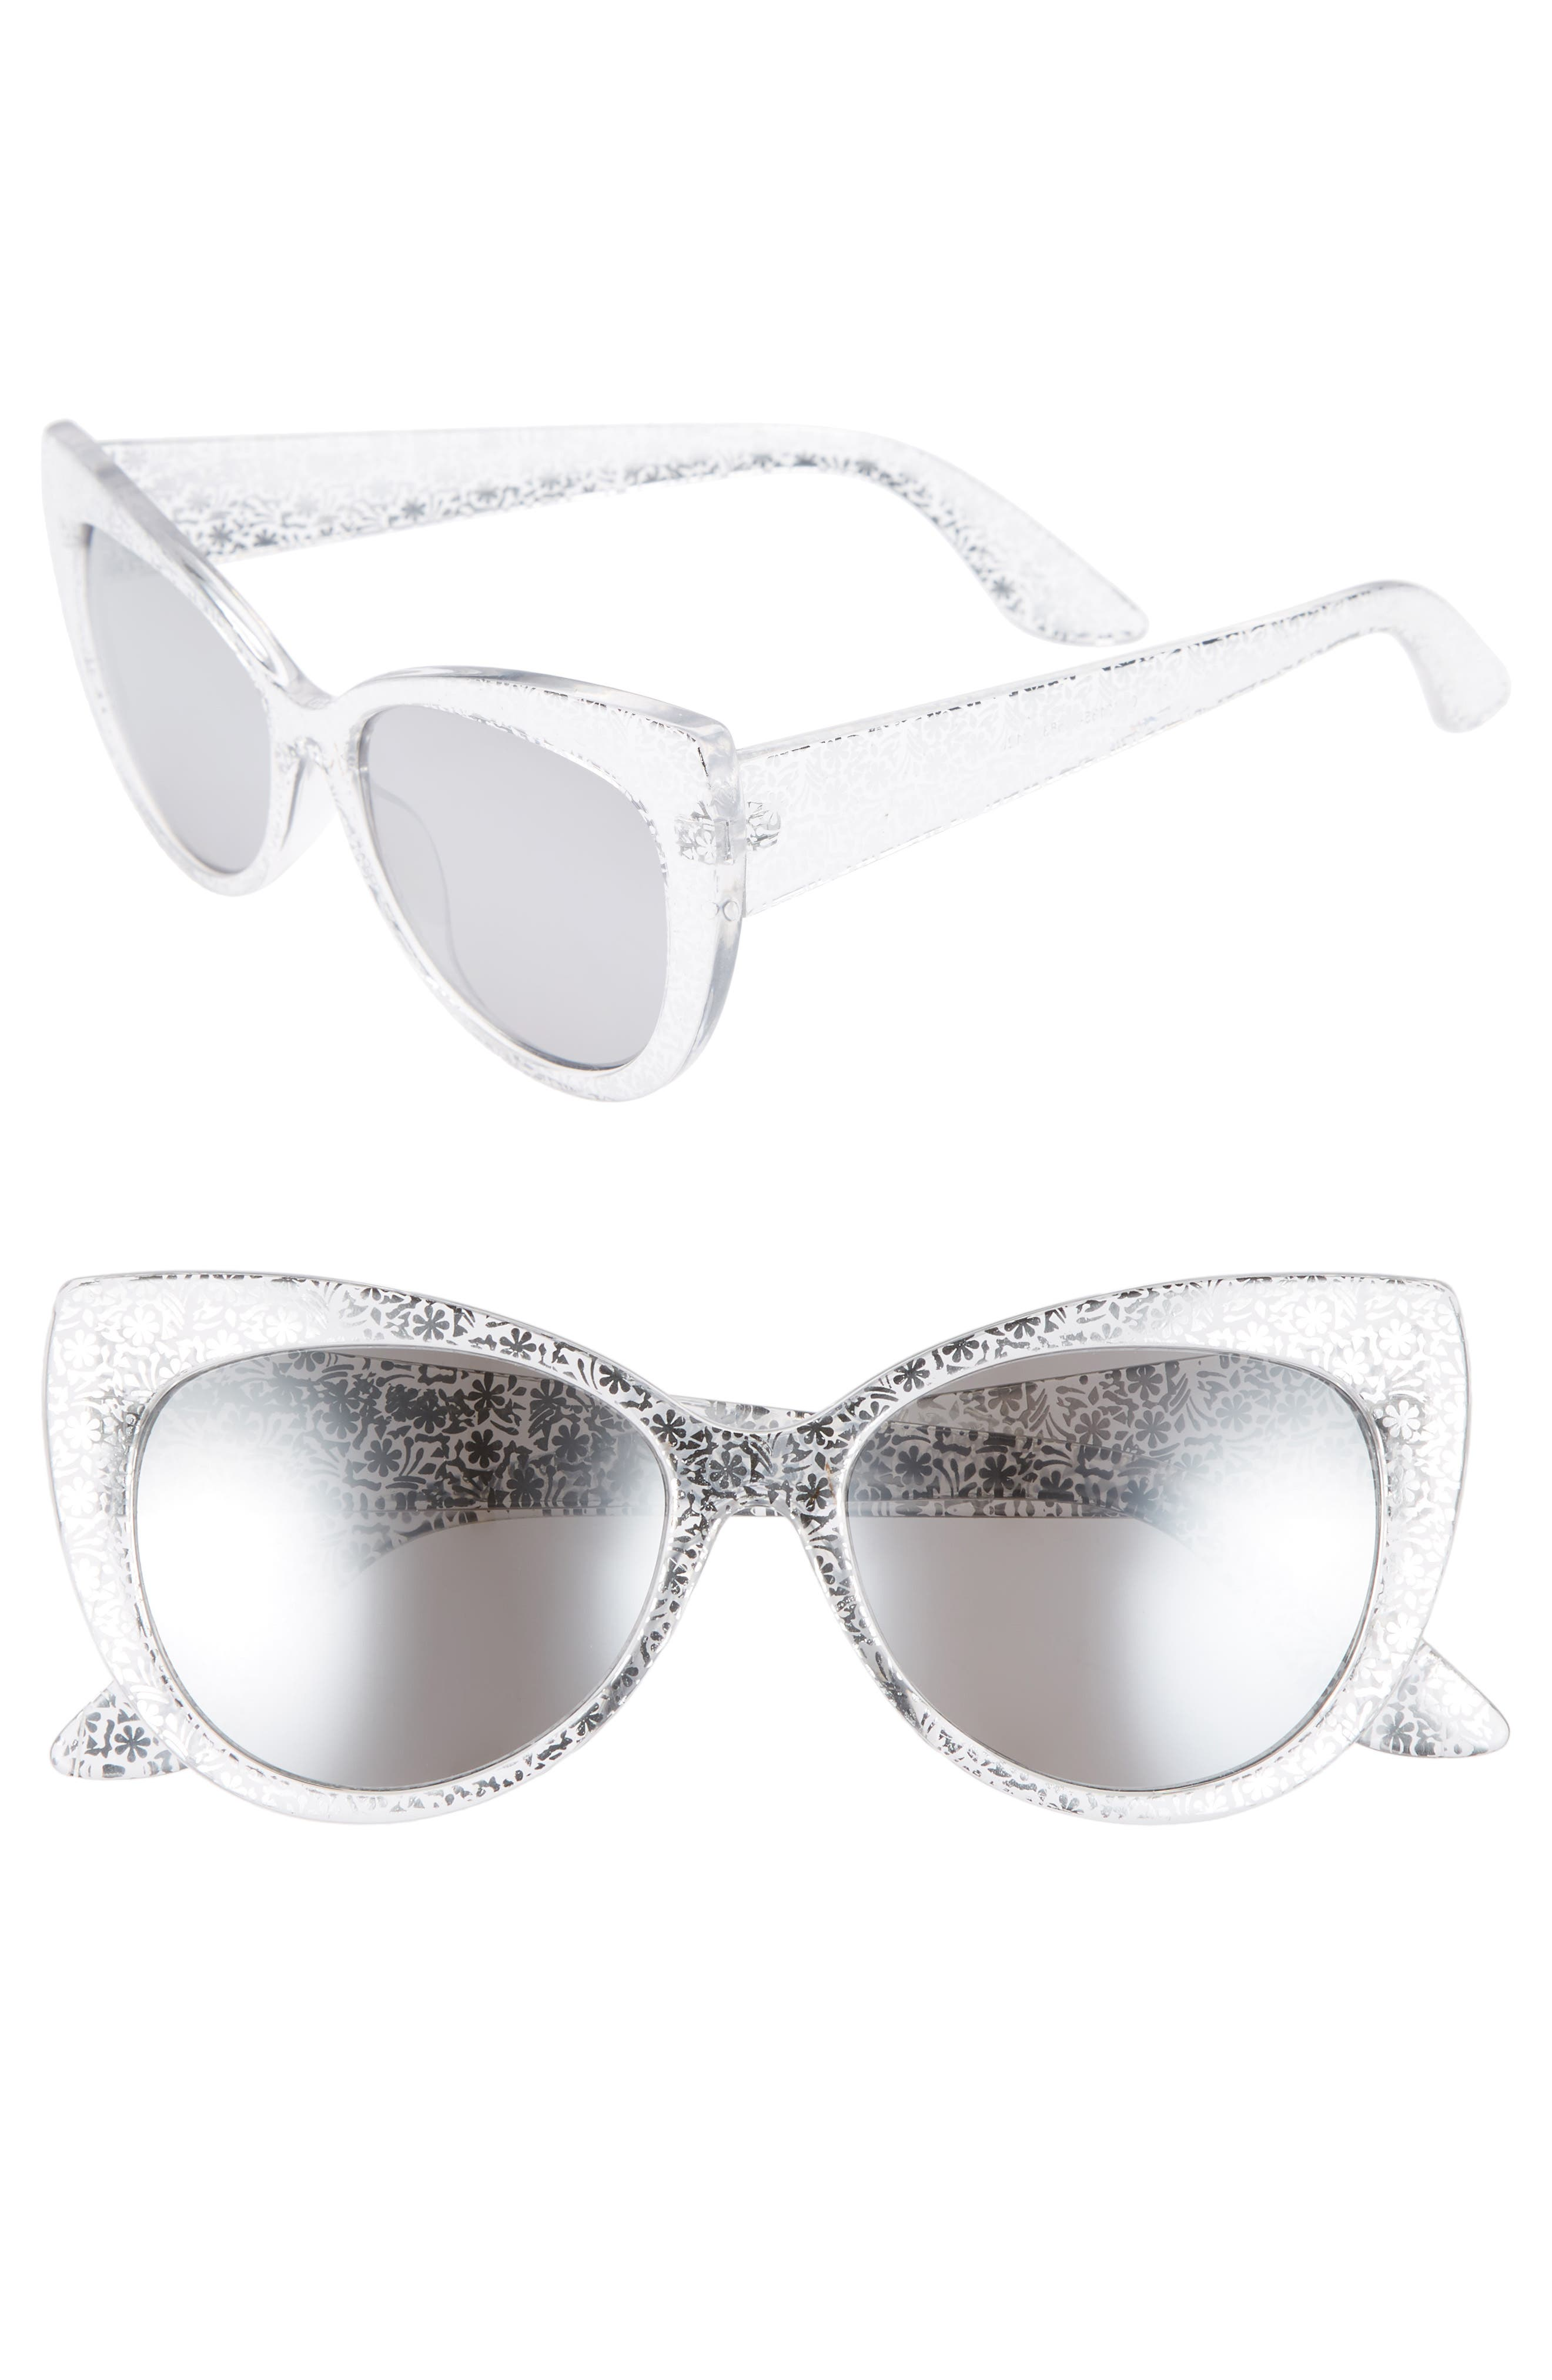 55mm Floral Cat Eye Sunglasses,                         Main,                         color, 040